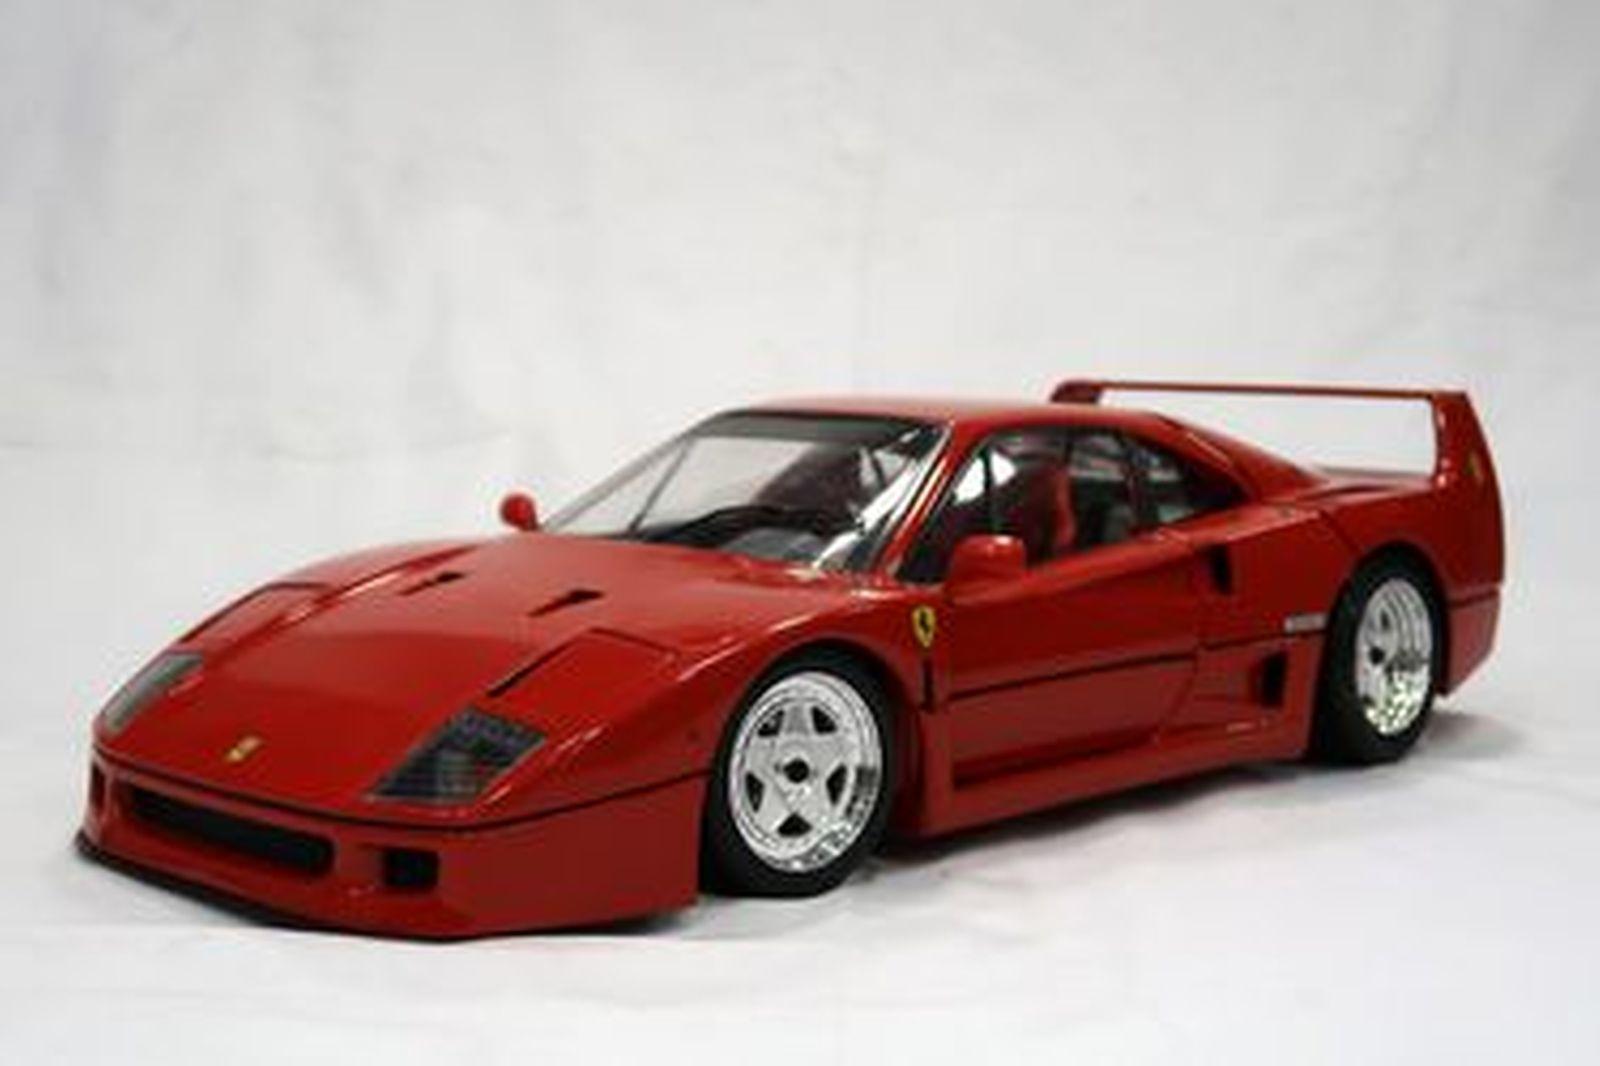 Model Car - Ferrari F40 by Pocher (1:8 scale)